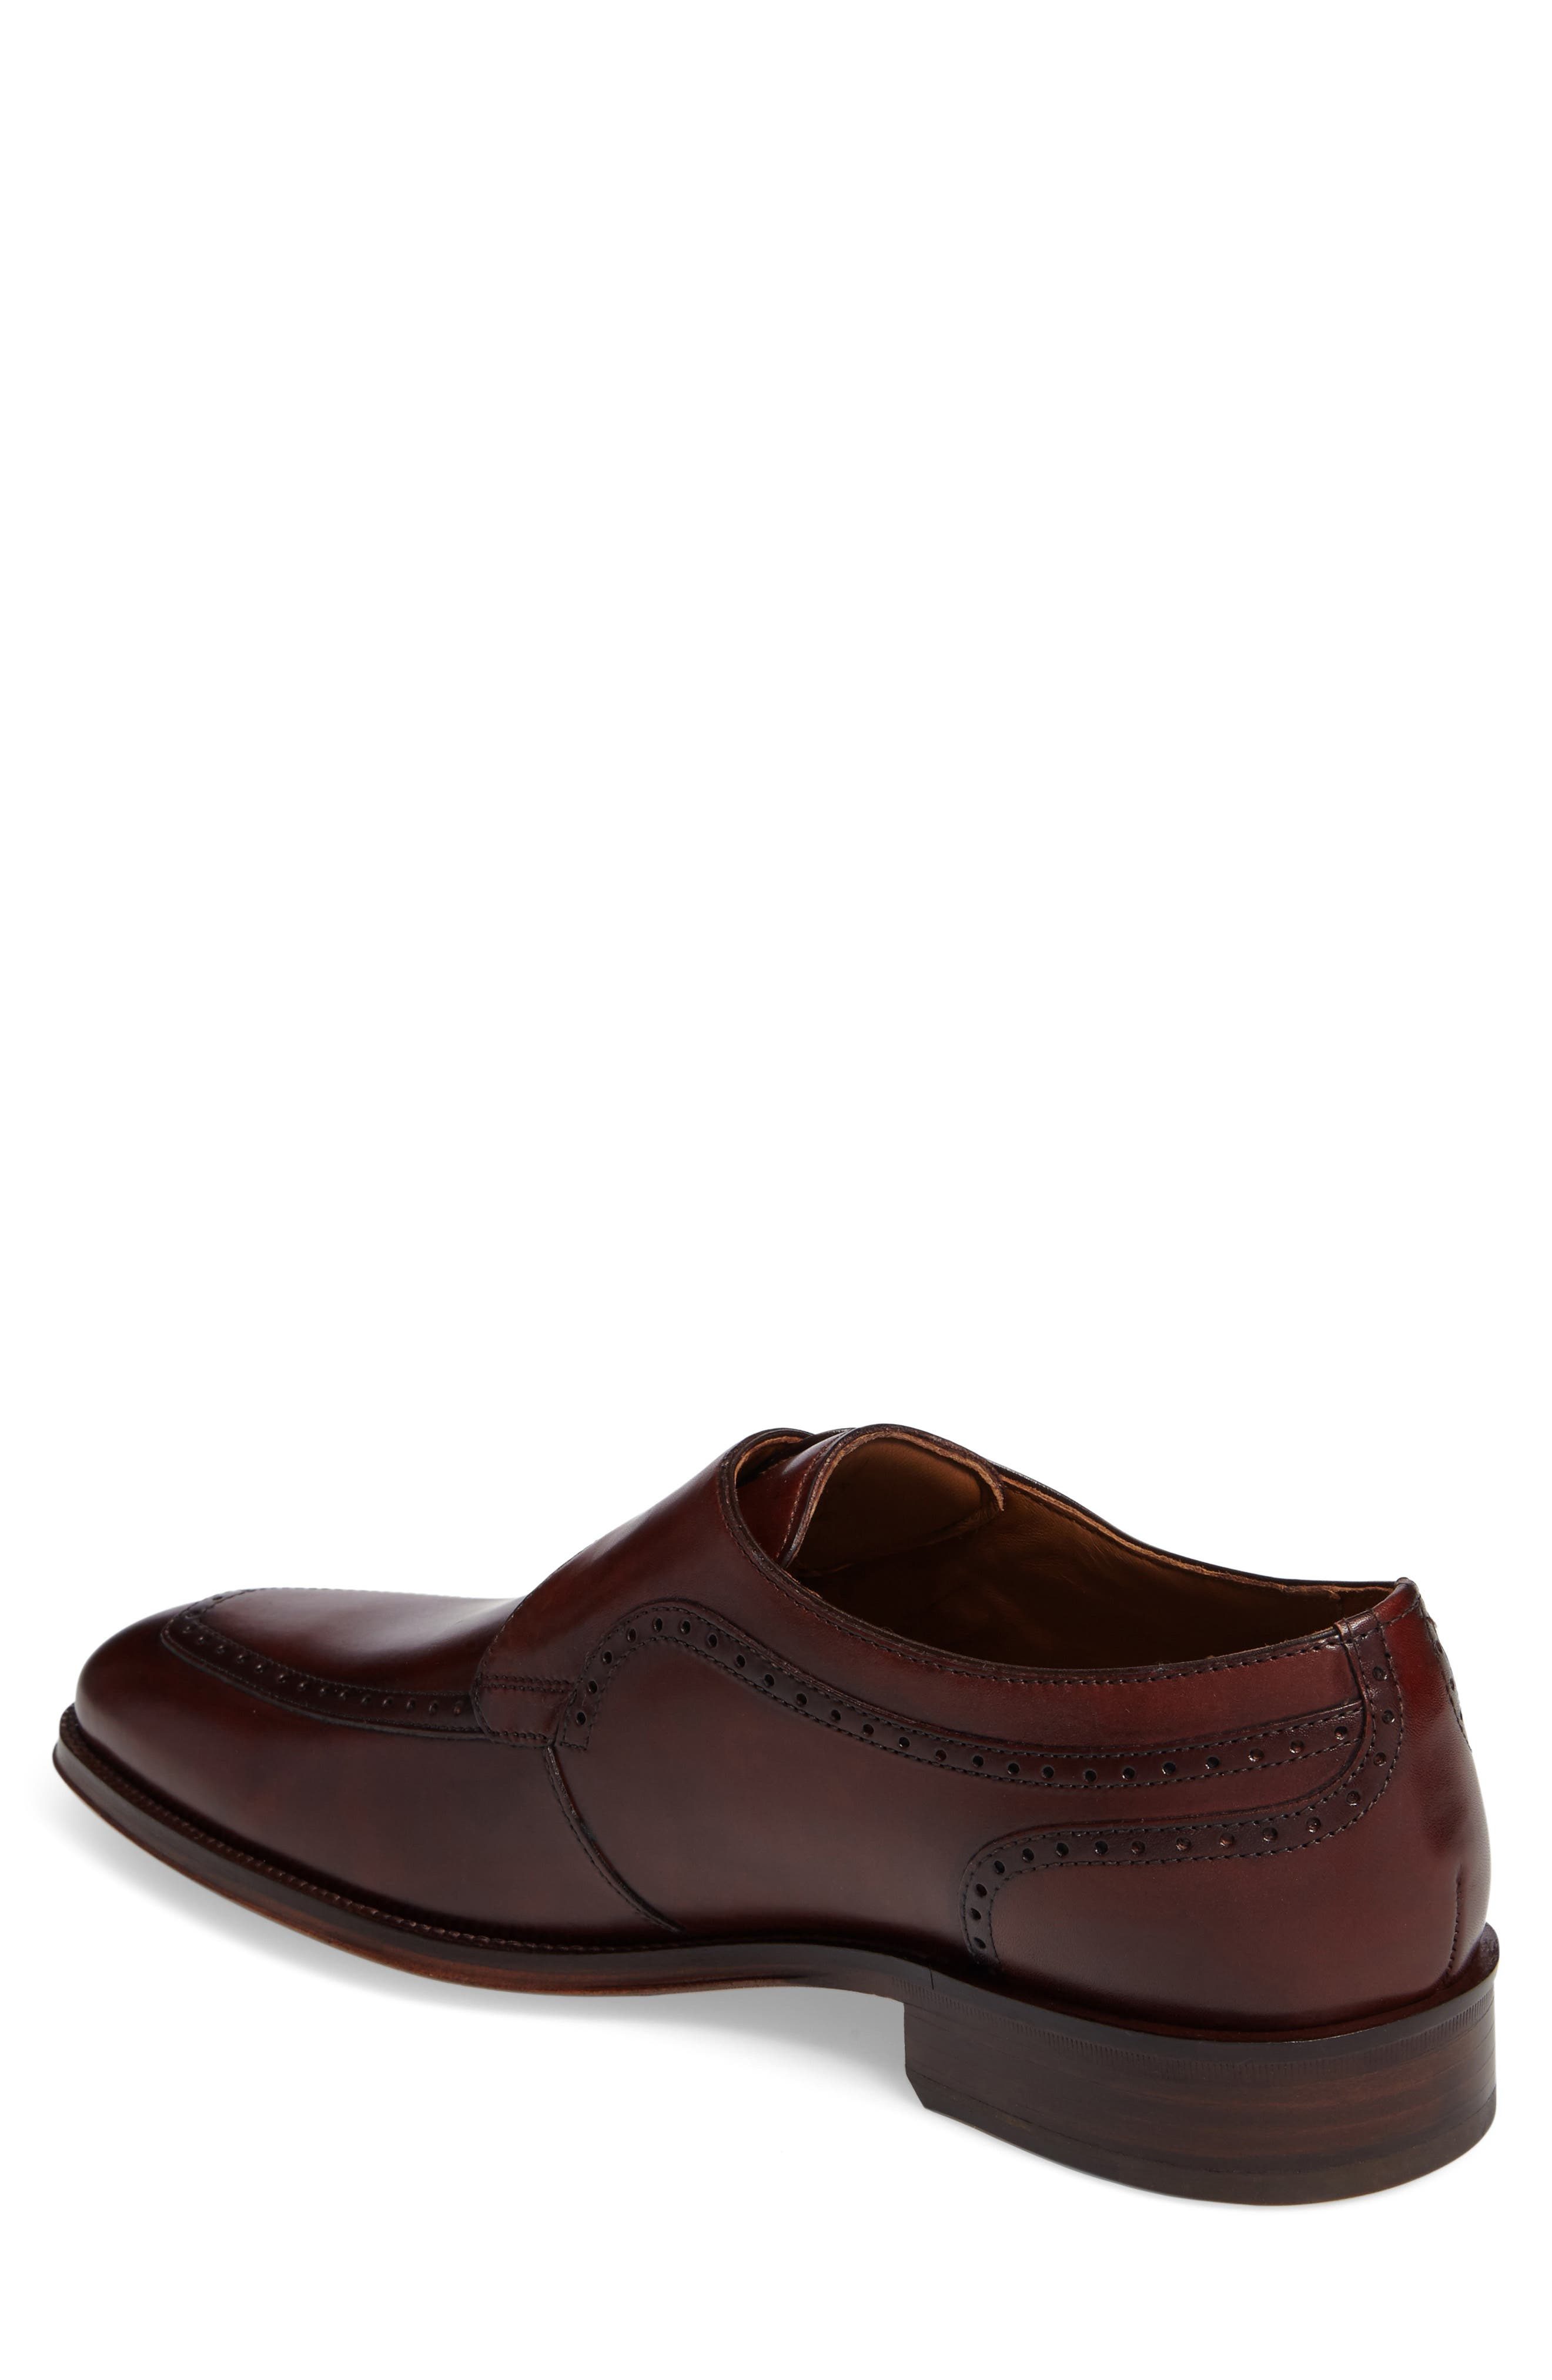 Boydstun Monk Strap Shoe,                             Alternate thumbnail 4, color,